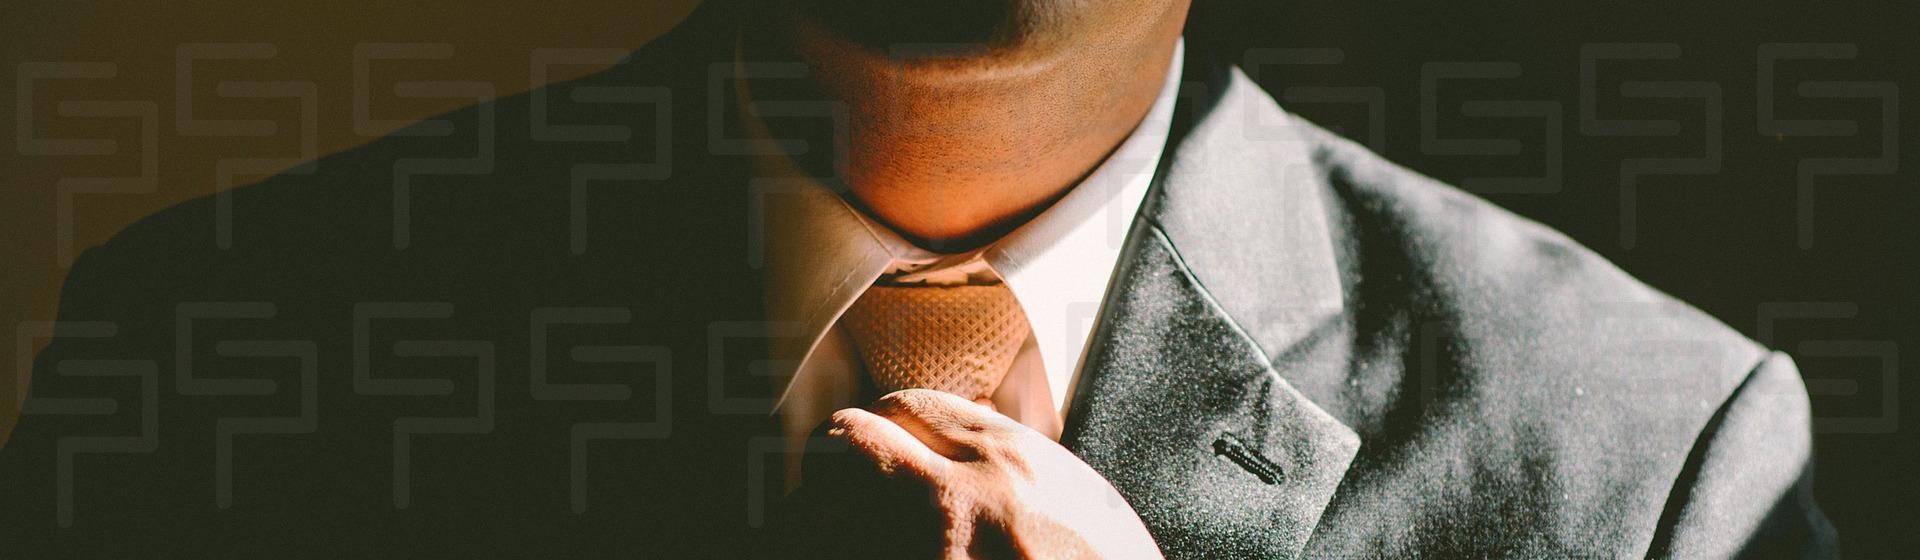 Curso liderazgoempresarial 1